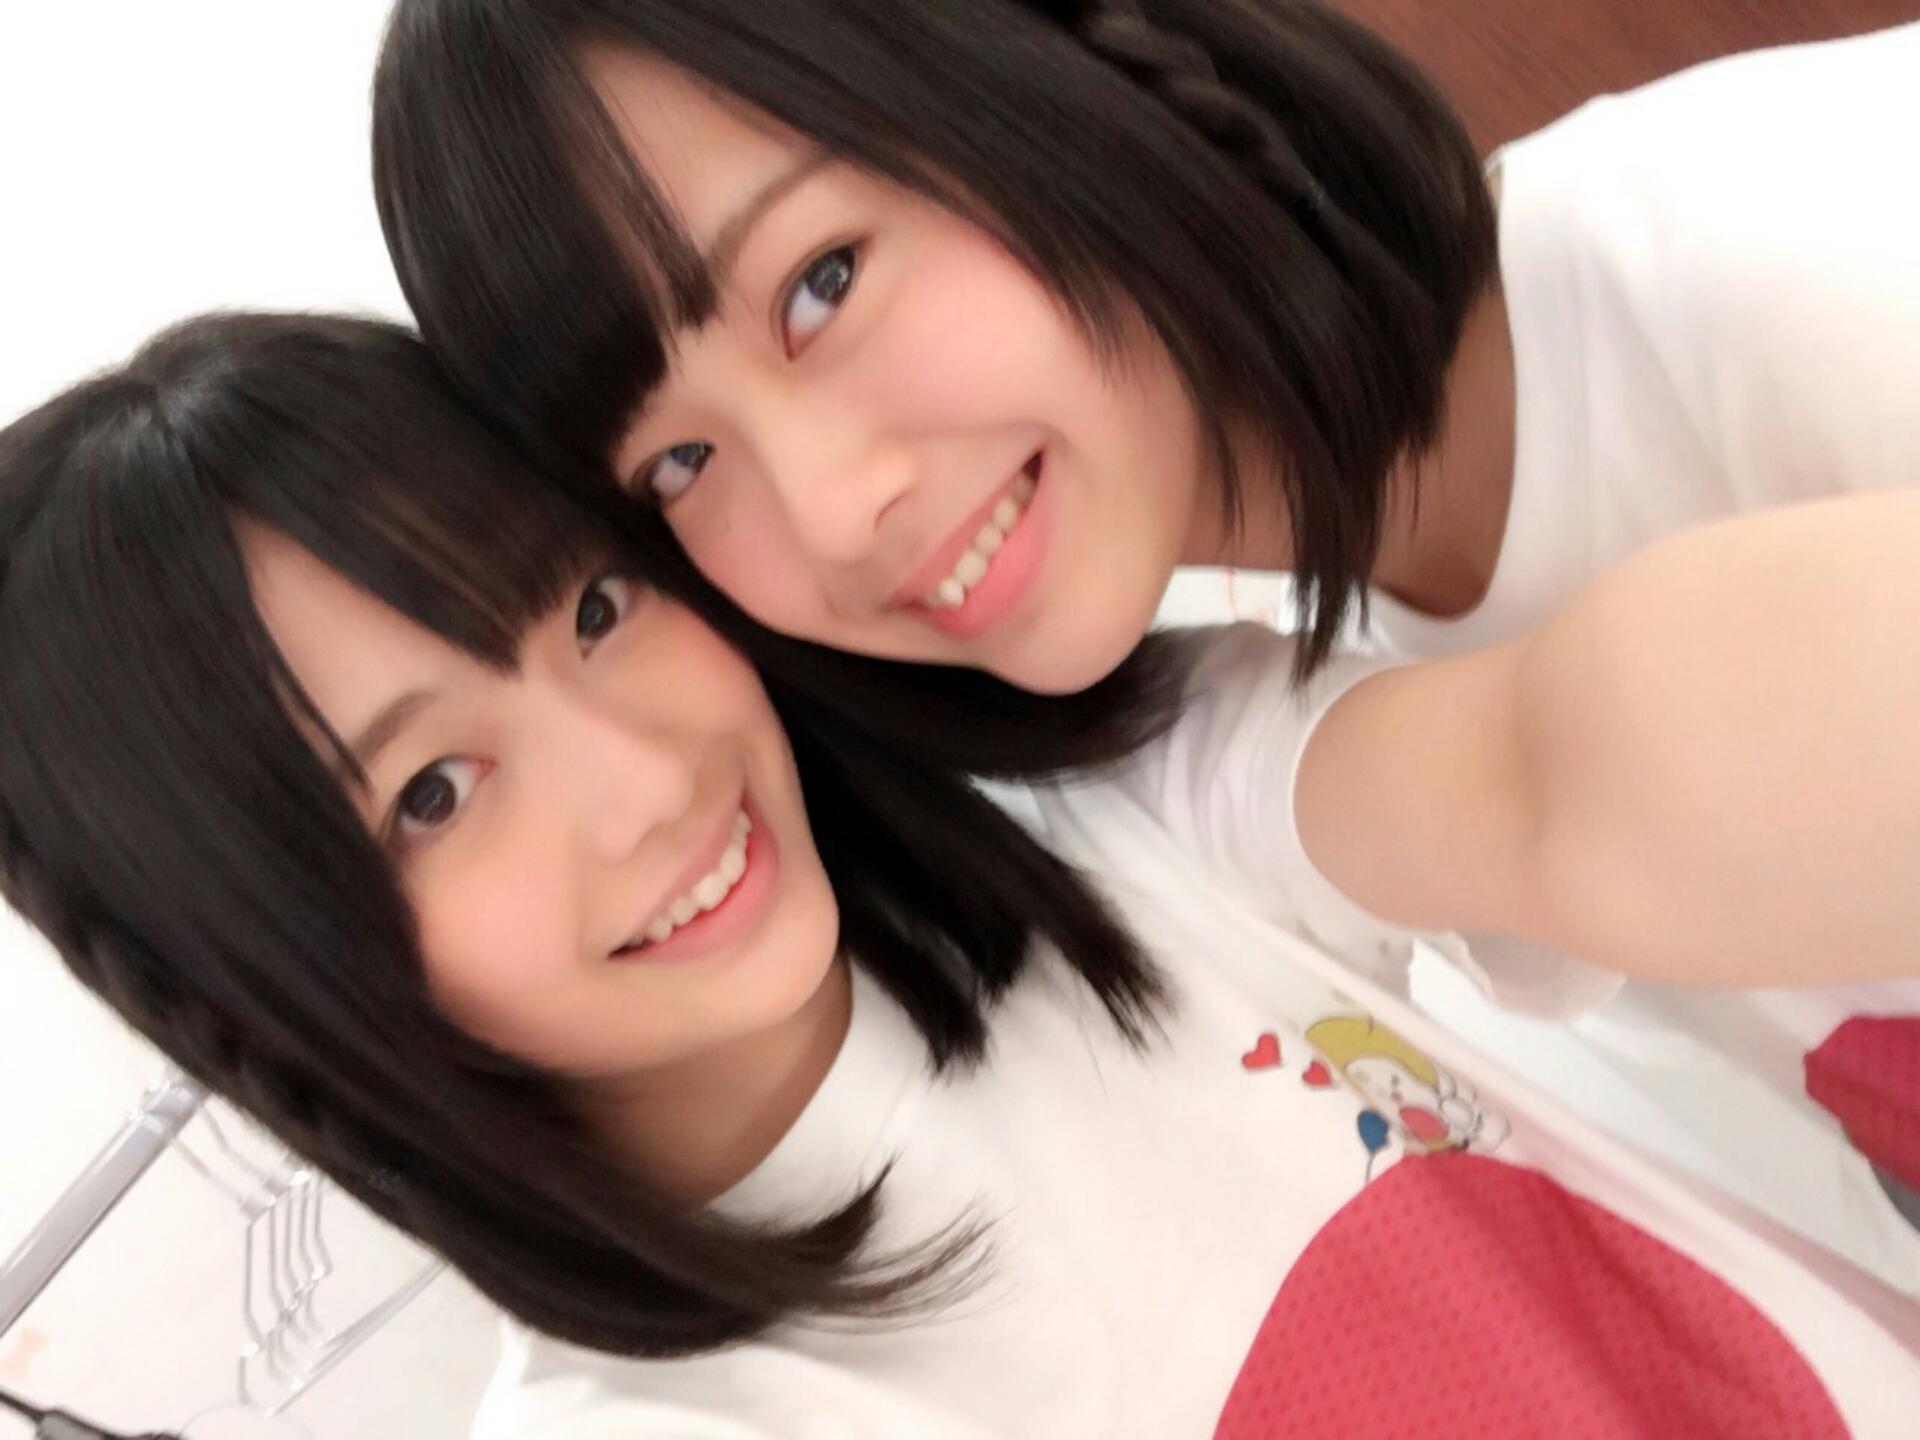 【AKB48卒業生】早坂つむぎ応援スレ★23【チーム8山形県代表】 YouTube動画>7本 ->画像>121枚